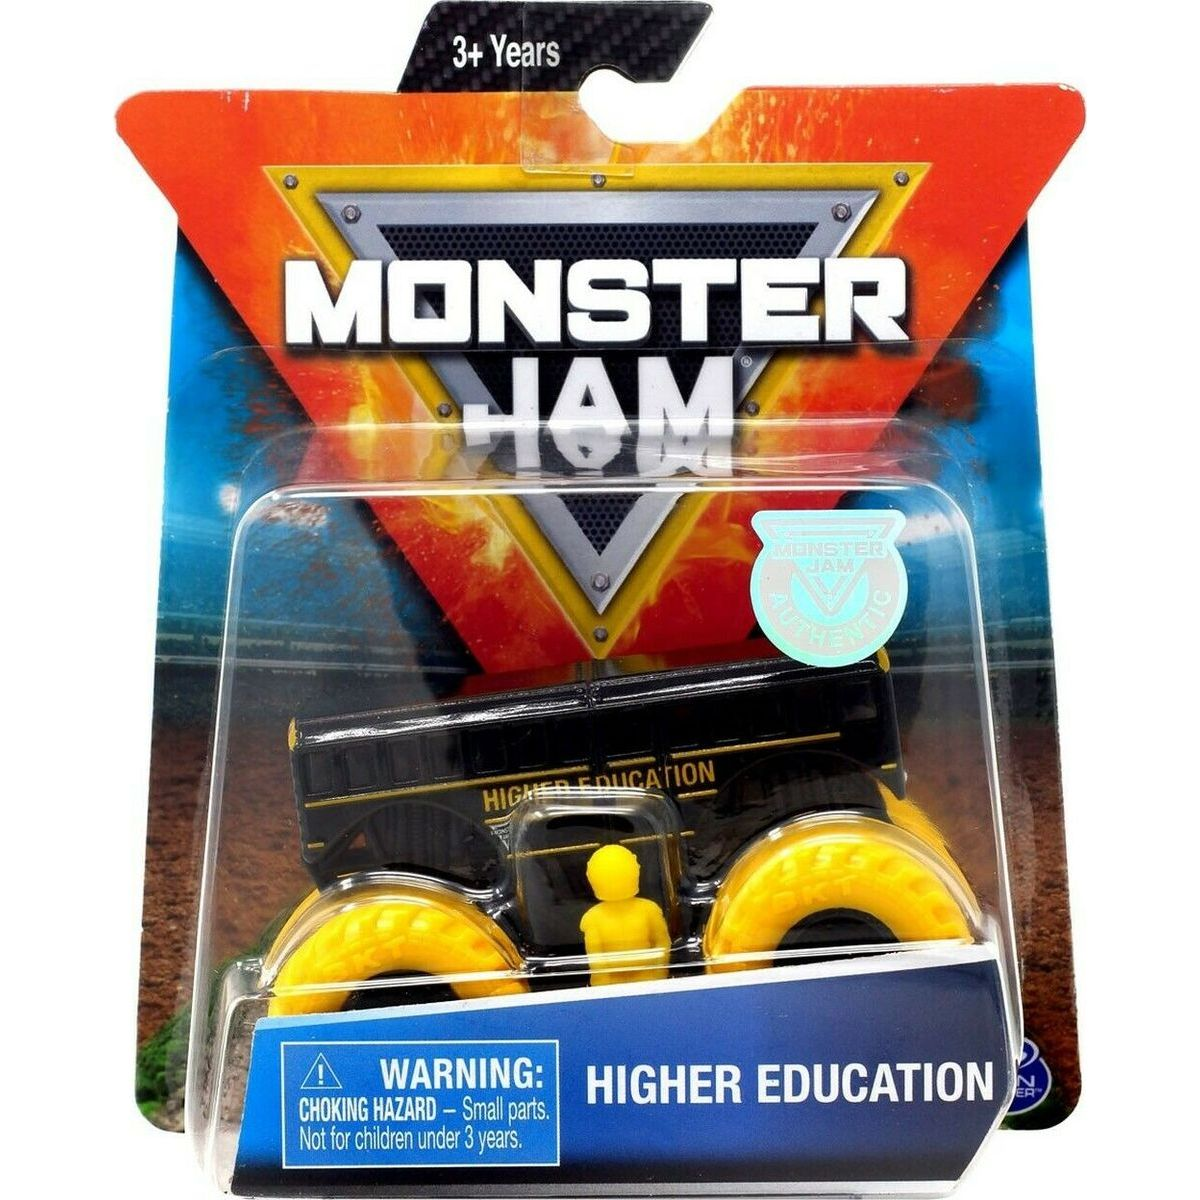 Monster Jam Zberateľská Die-Cast autá 1:64 Higher Education